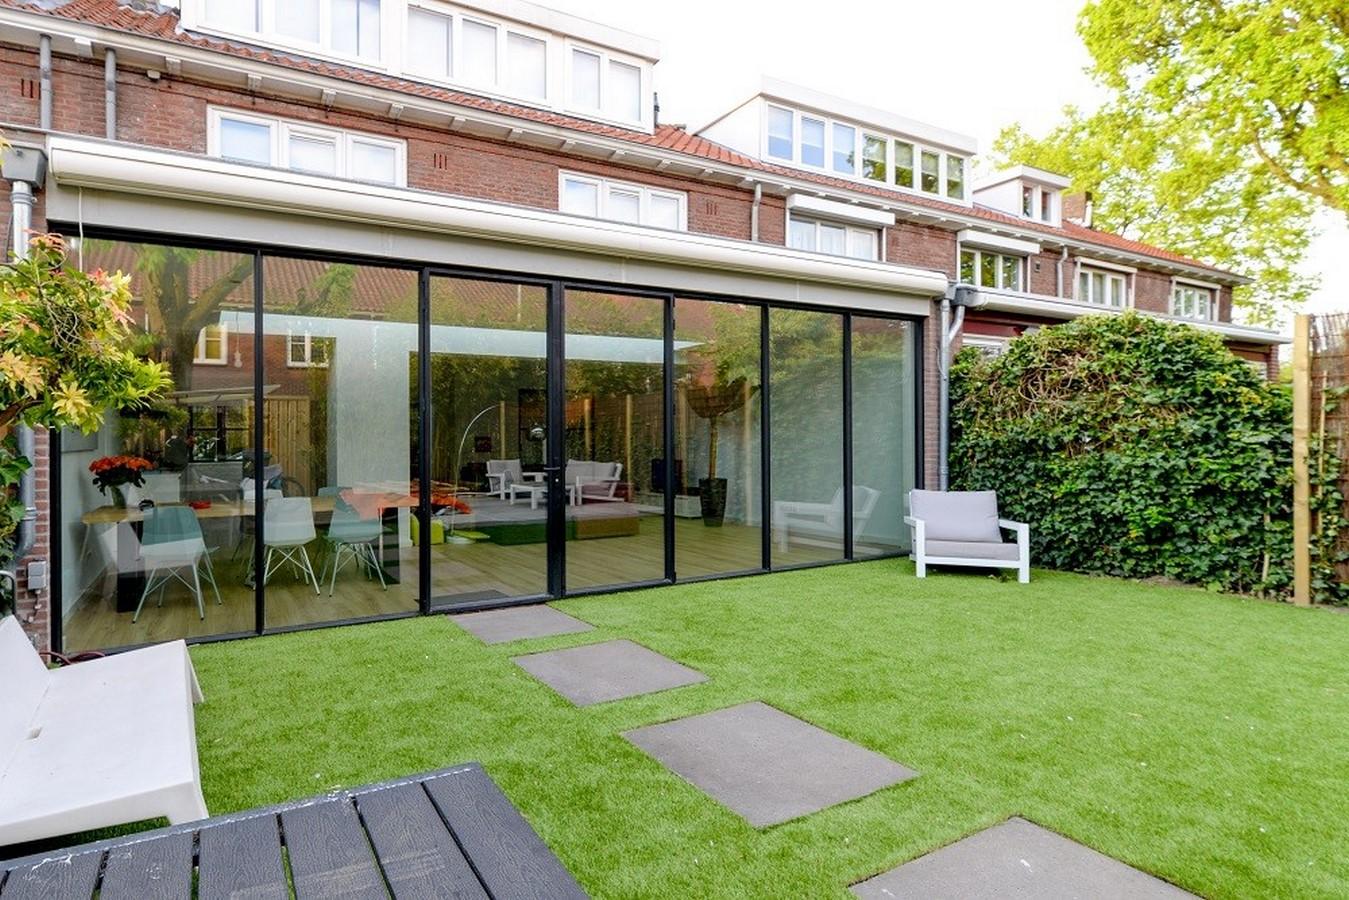 Architects in Breda - Top 55 Architects in Breda - Sheet32